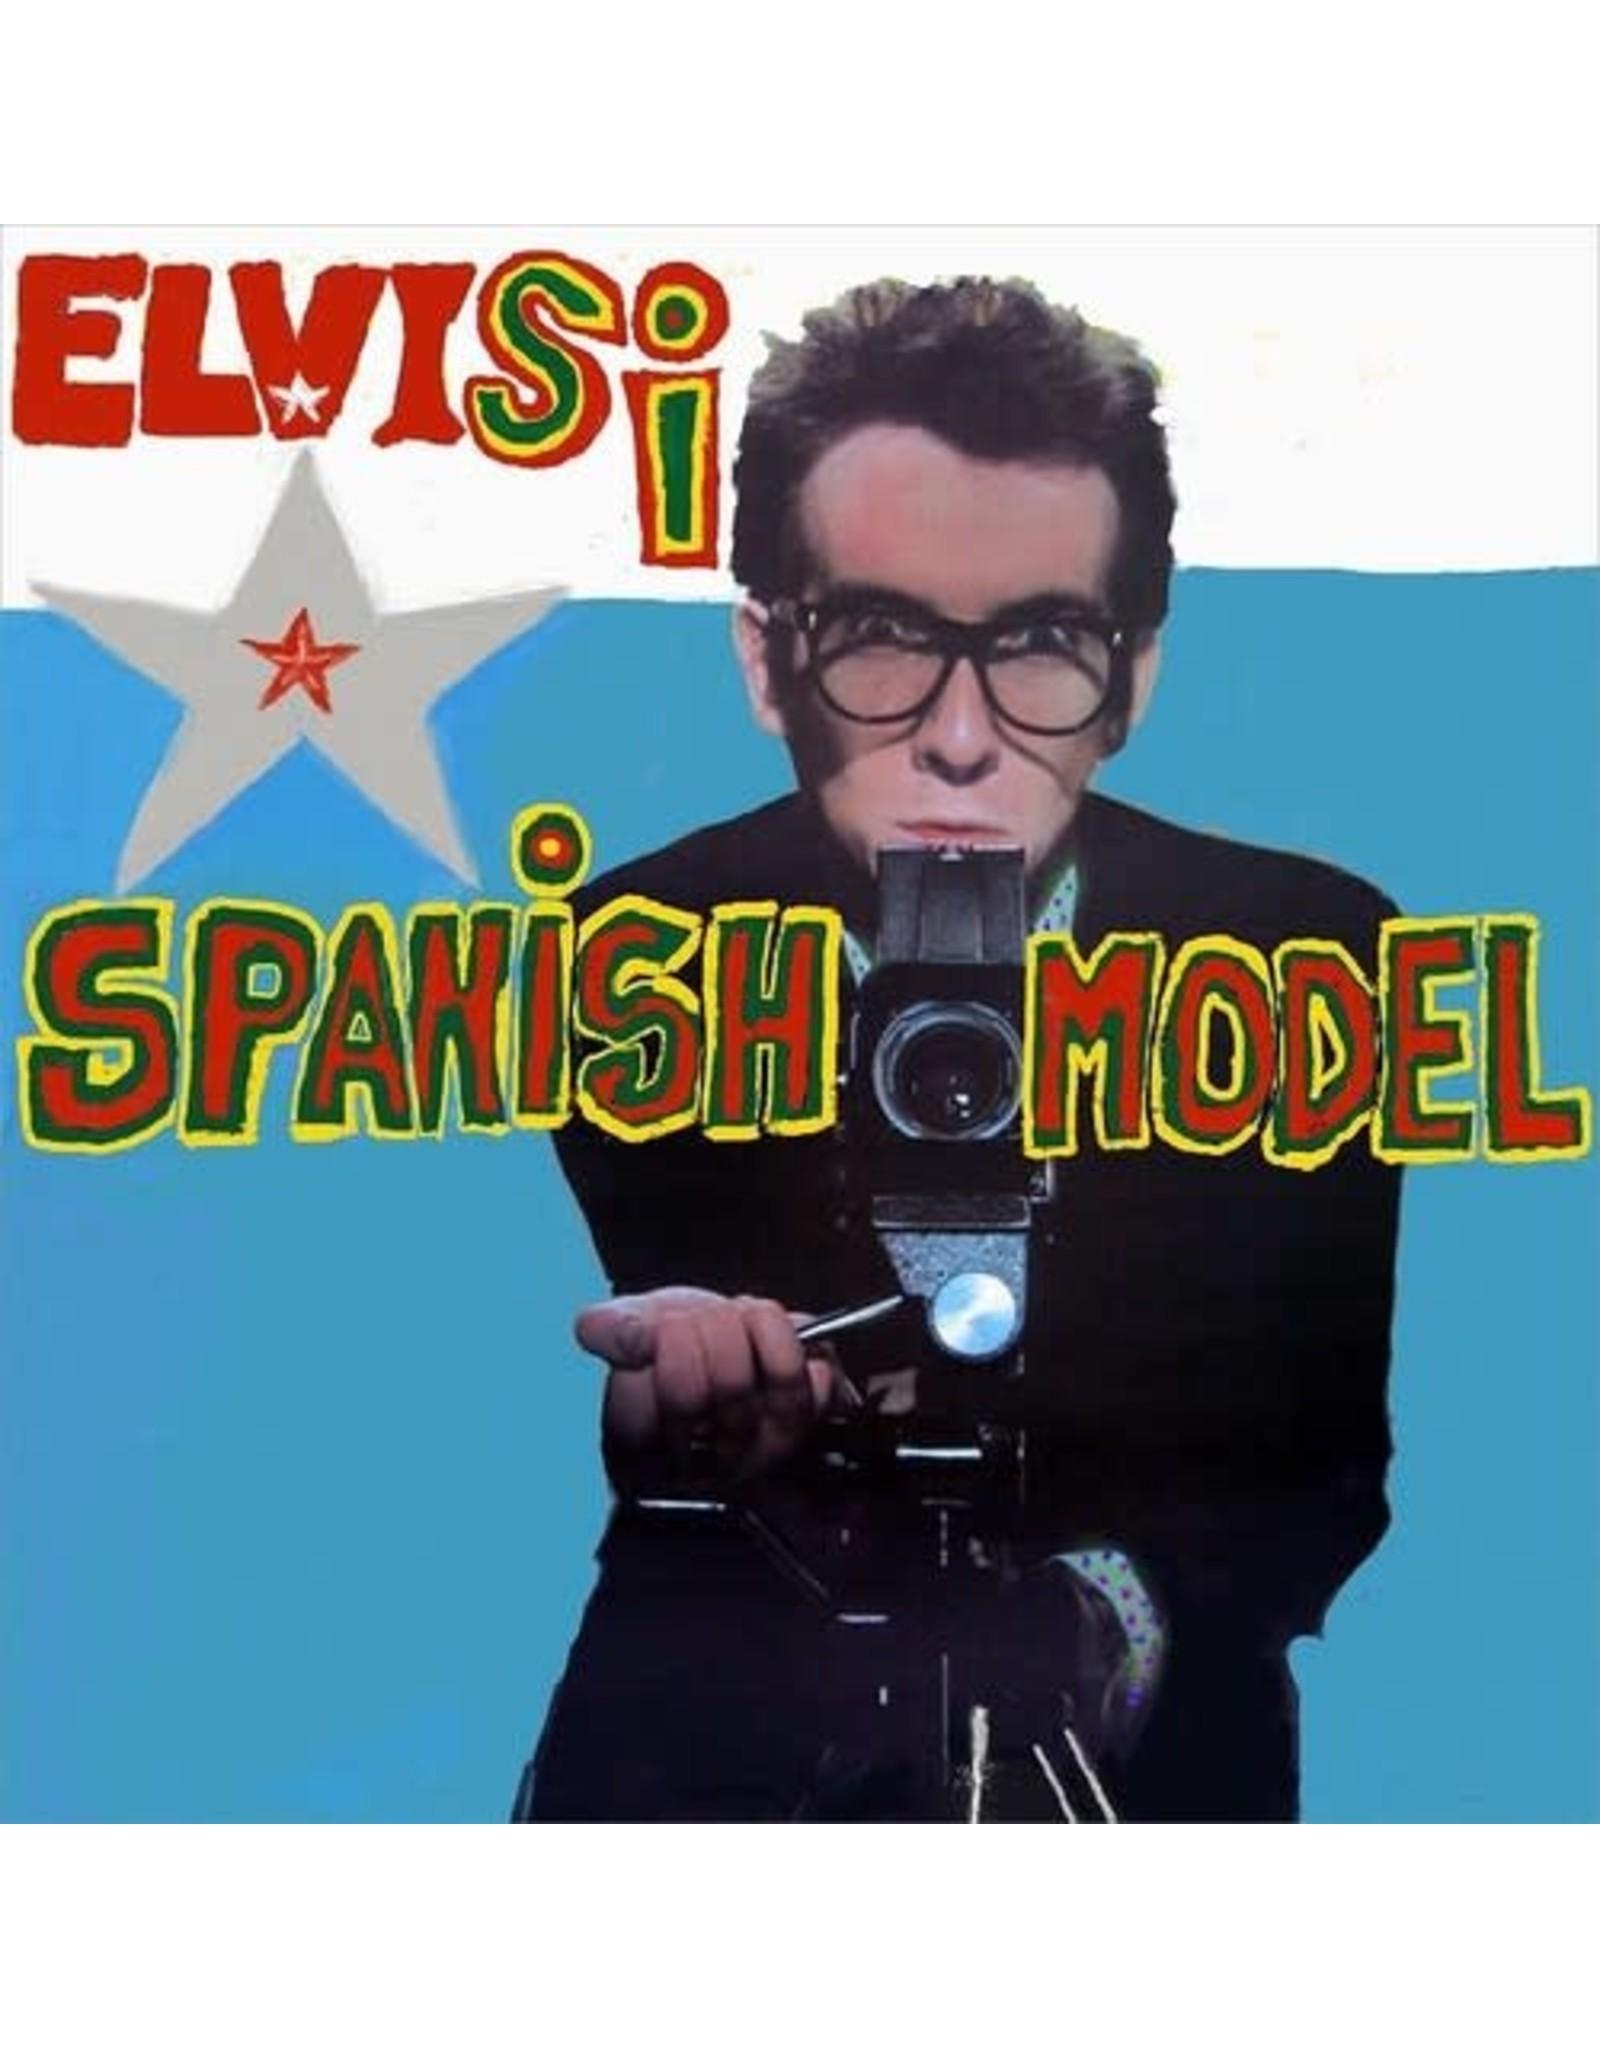 New Vinyl Elvis Costello & The Attractions - Spanish Model LP